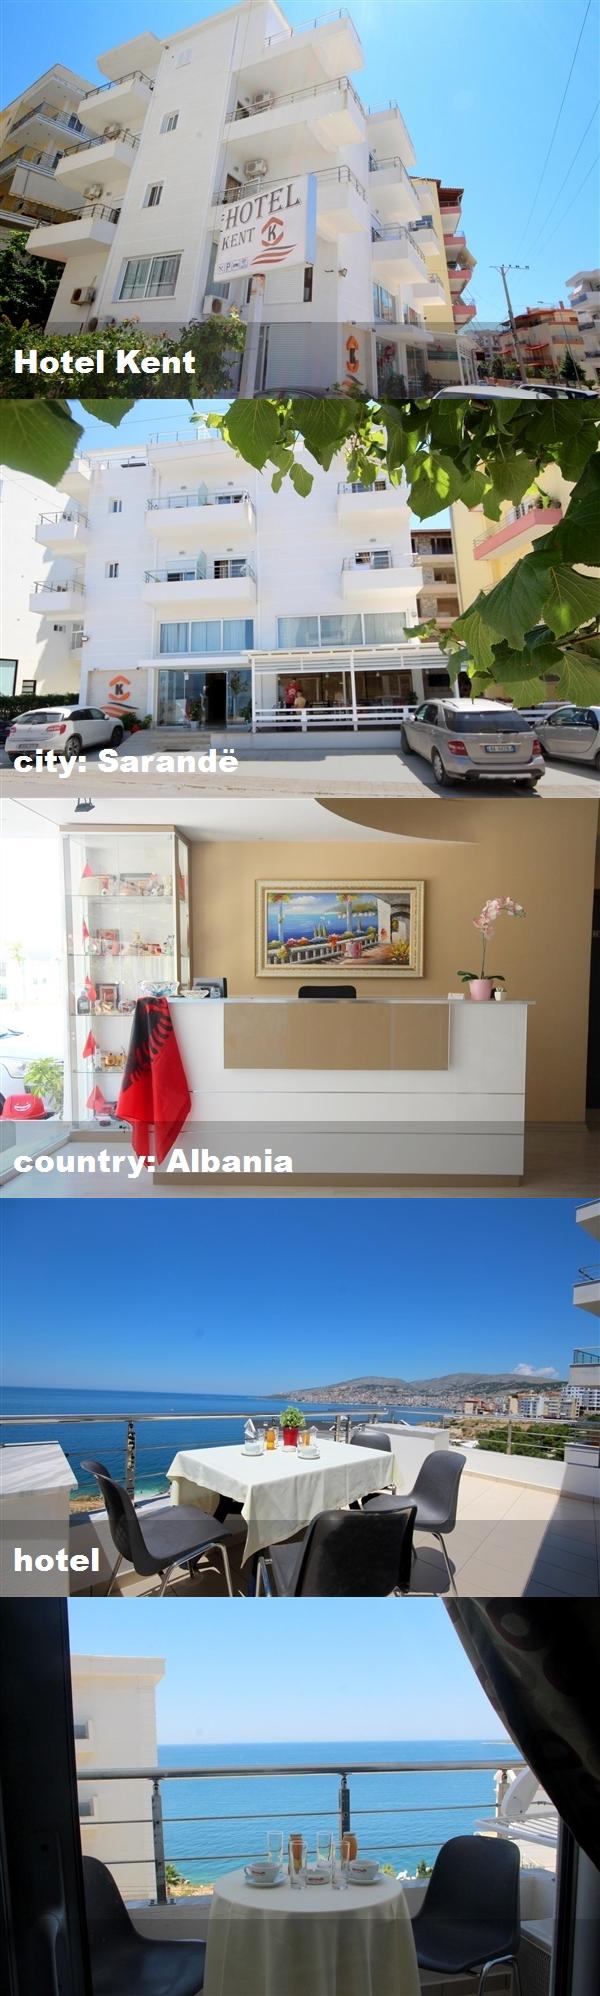 Hotel Kent City Sarandë Country Albania